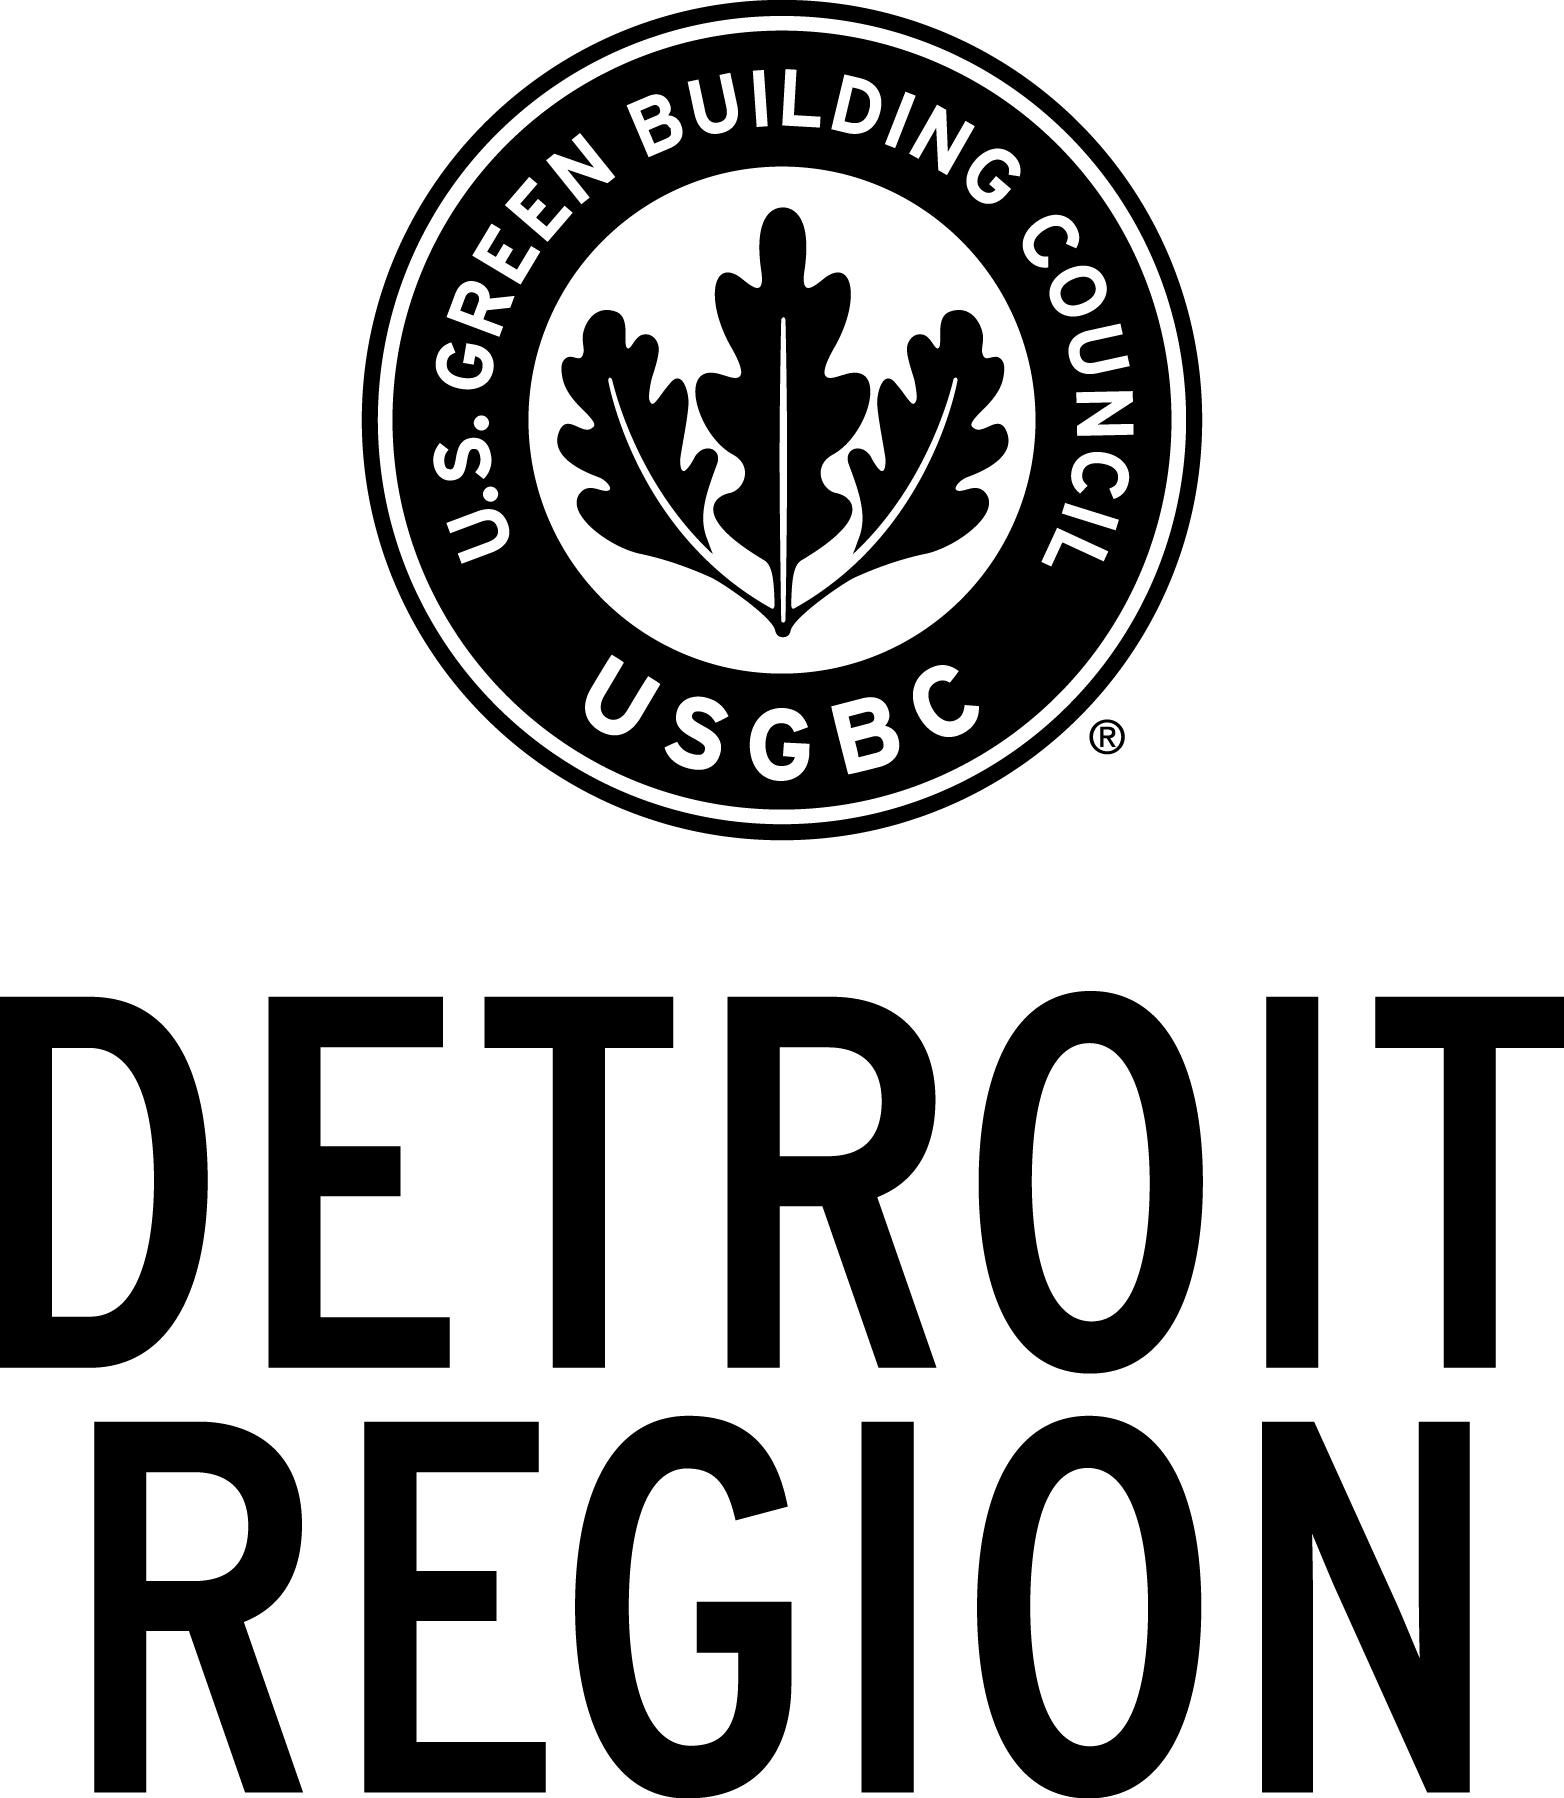 USGBC_DetRegion_stack_k.jpg